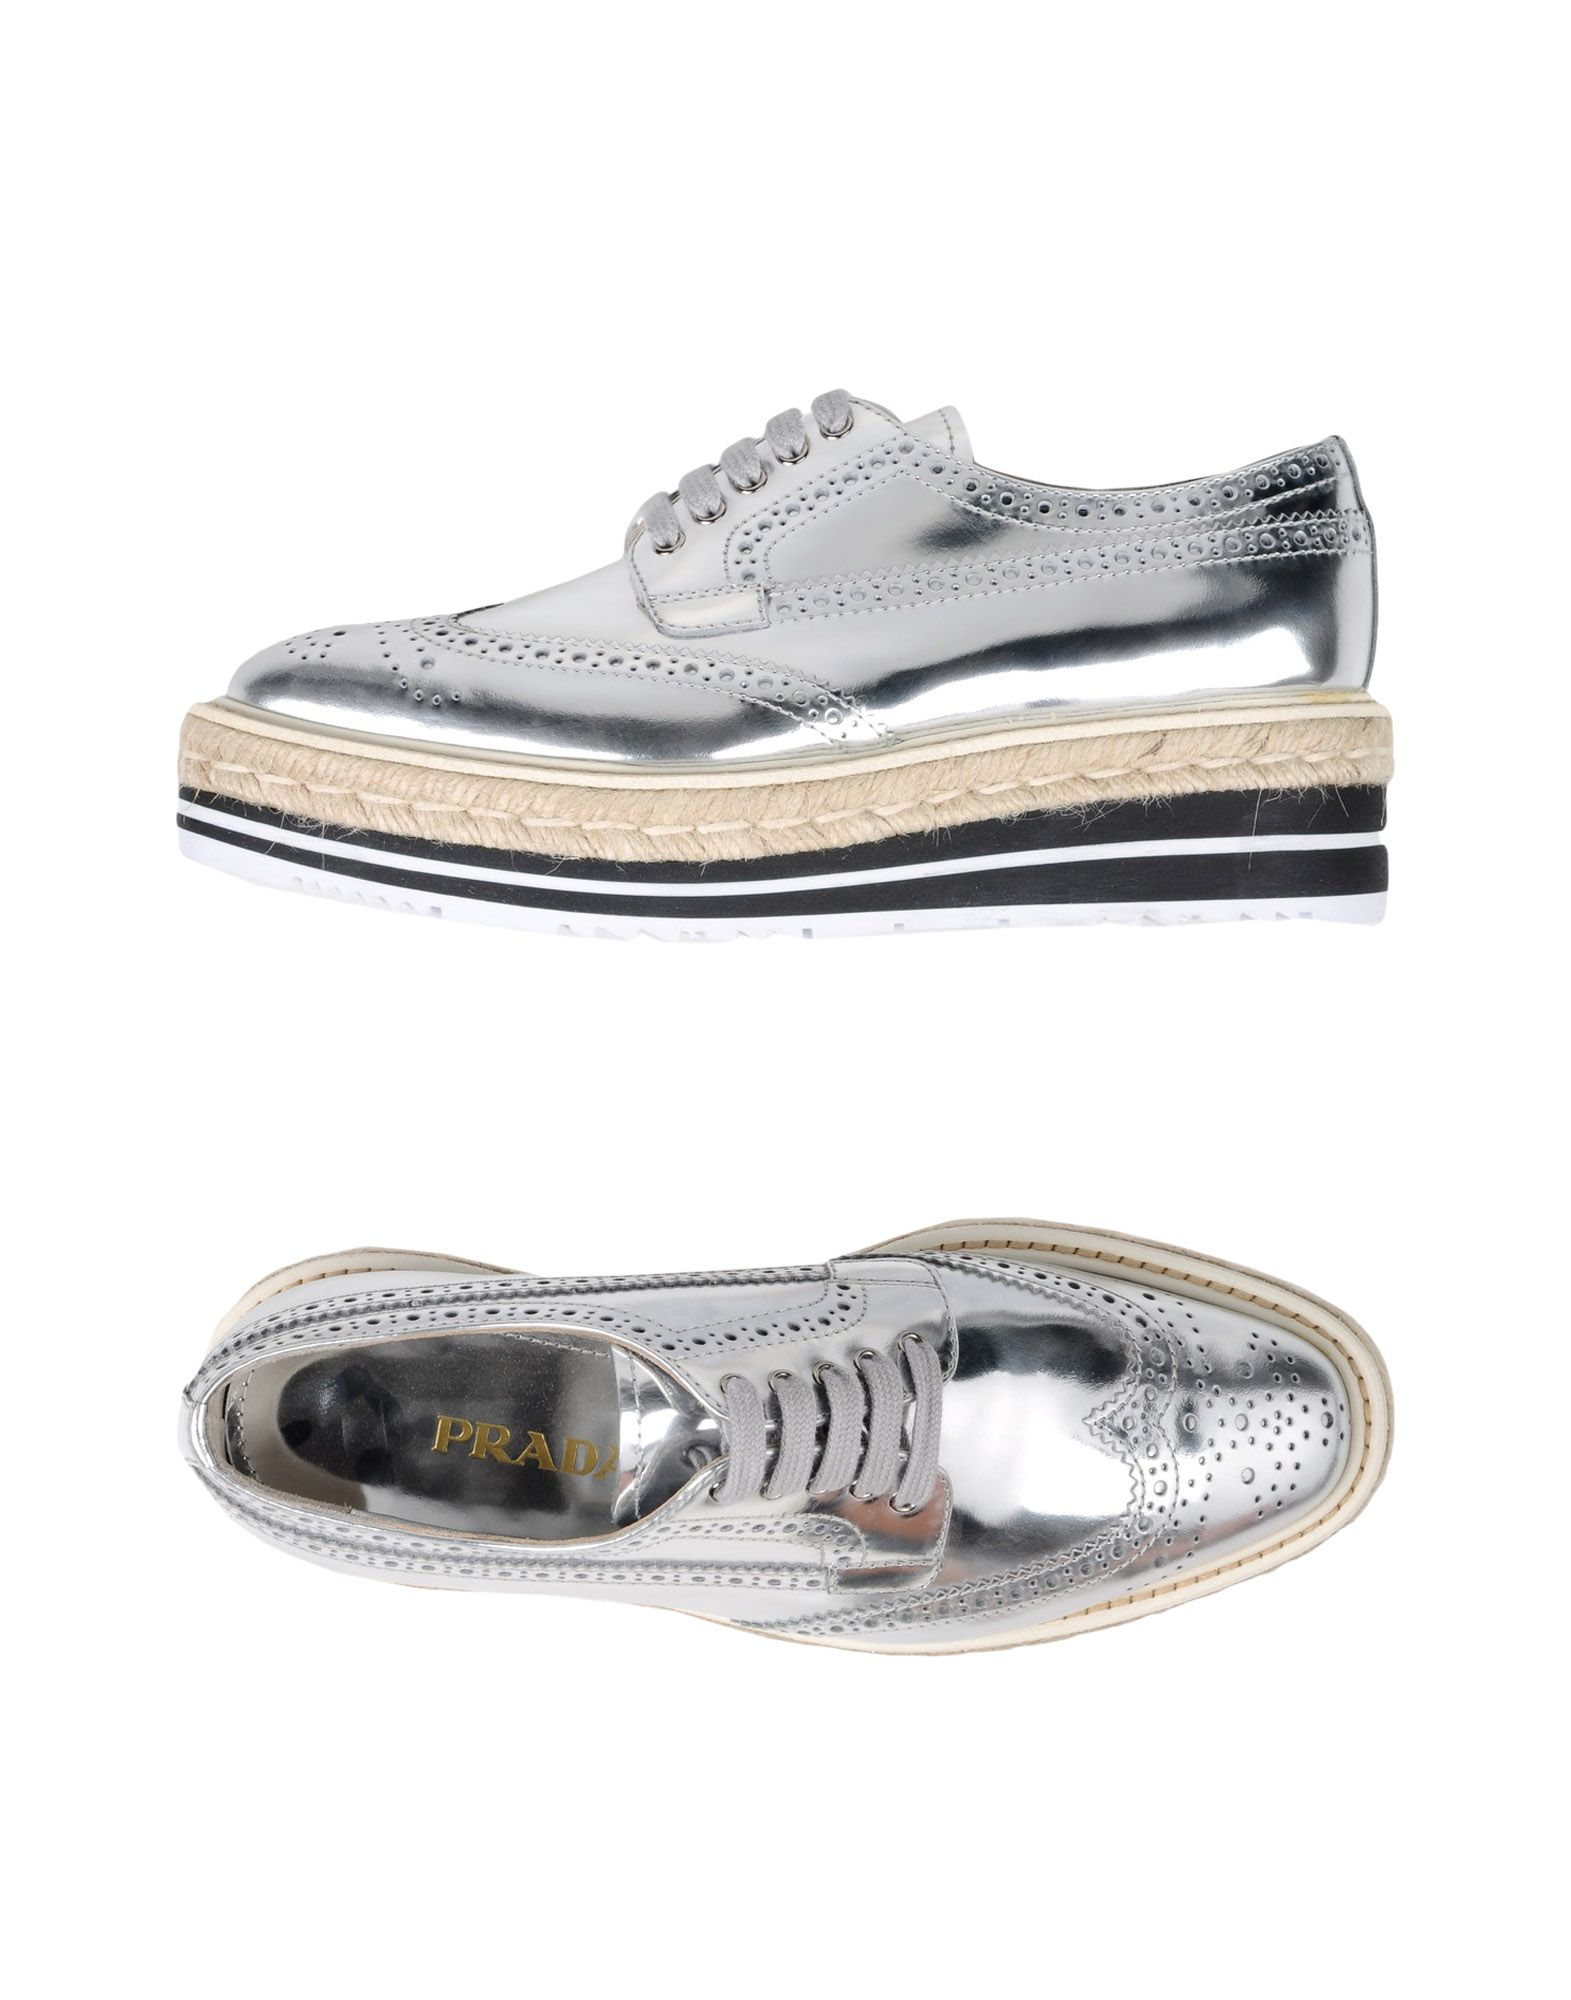 Gran descuento descuento Gran Zapato De Cordones Prada Mujer - Zapatos De Cordones Prada  Plata da5053